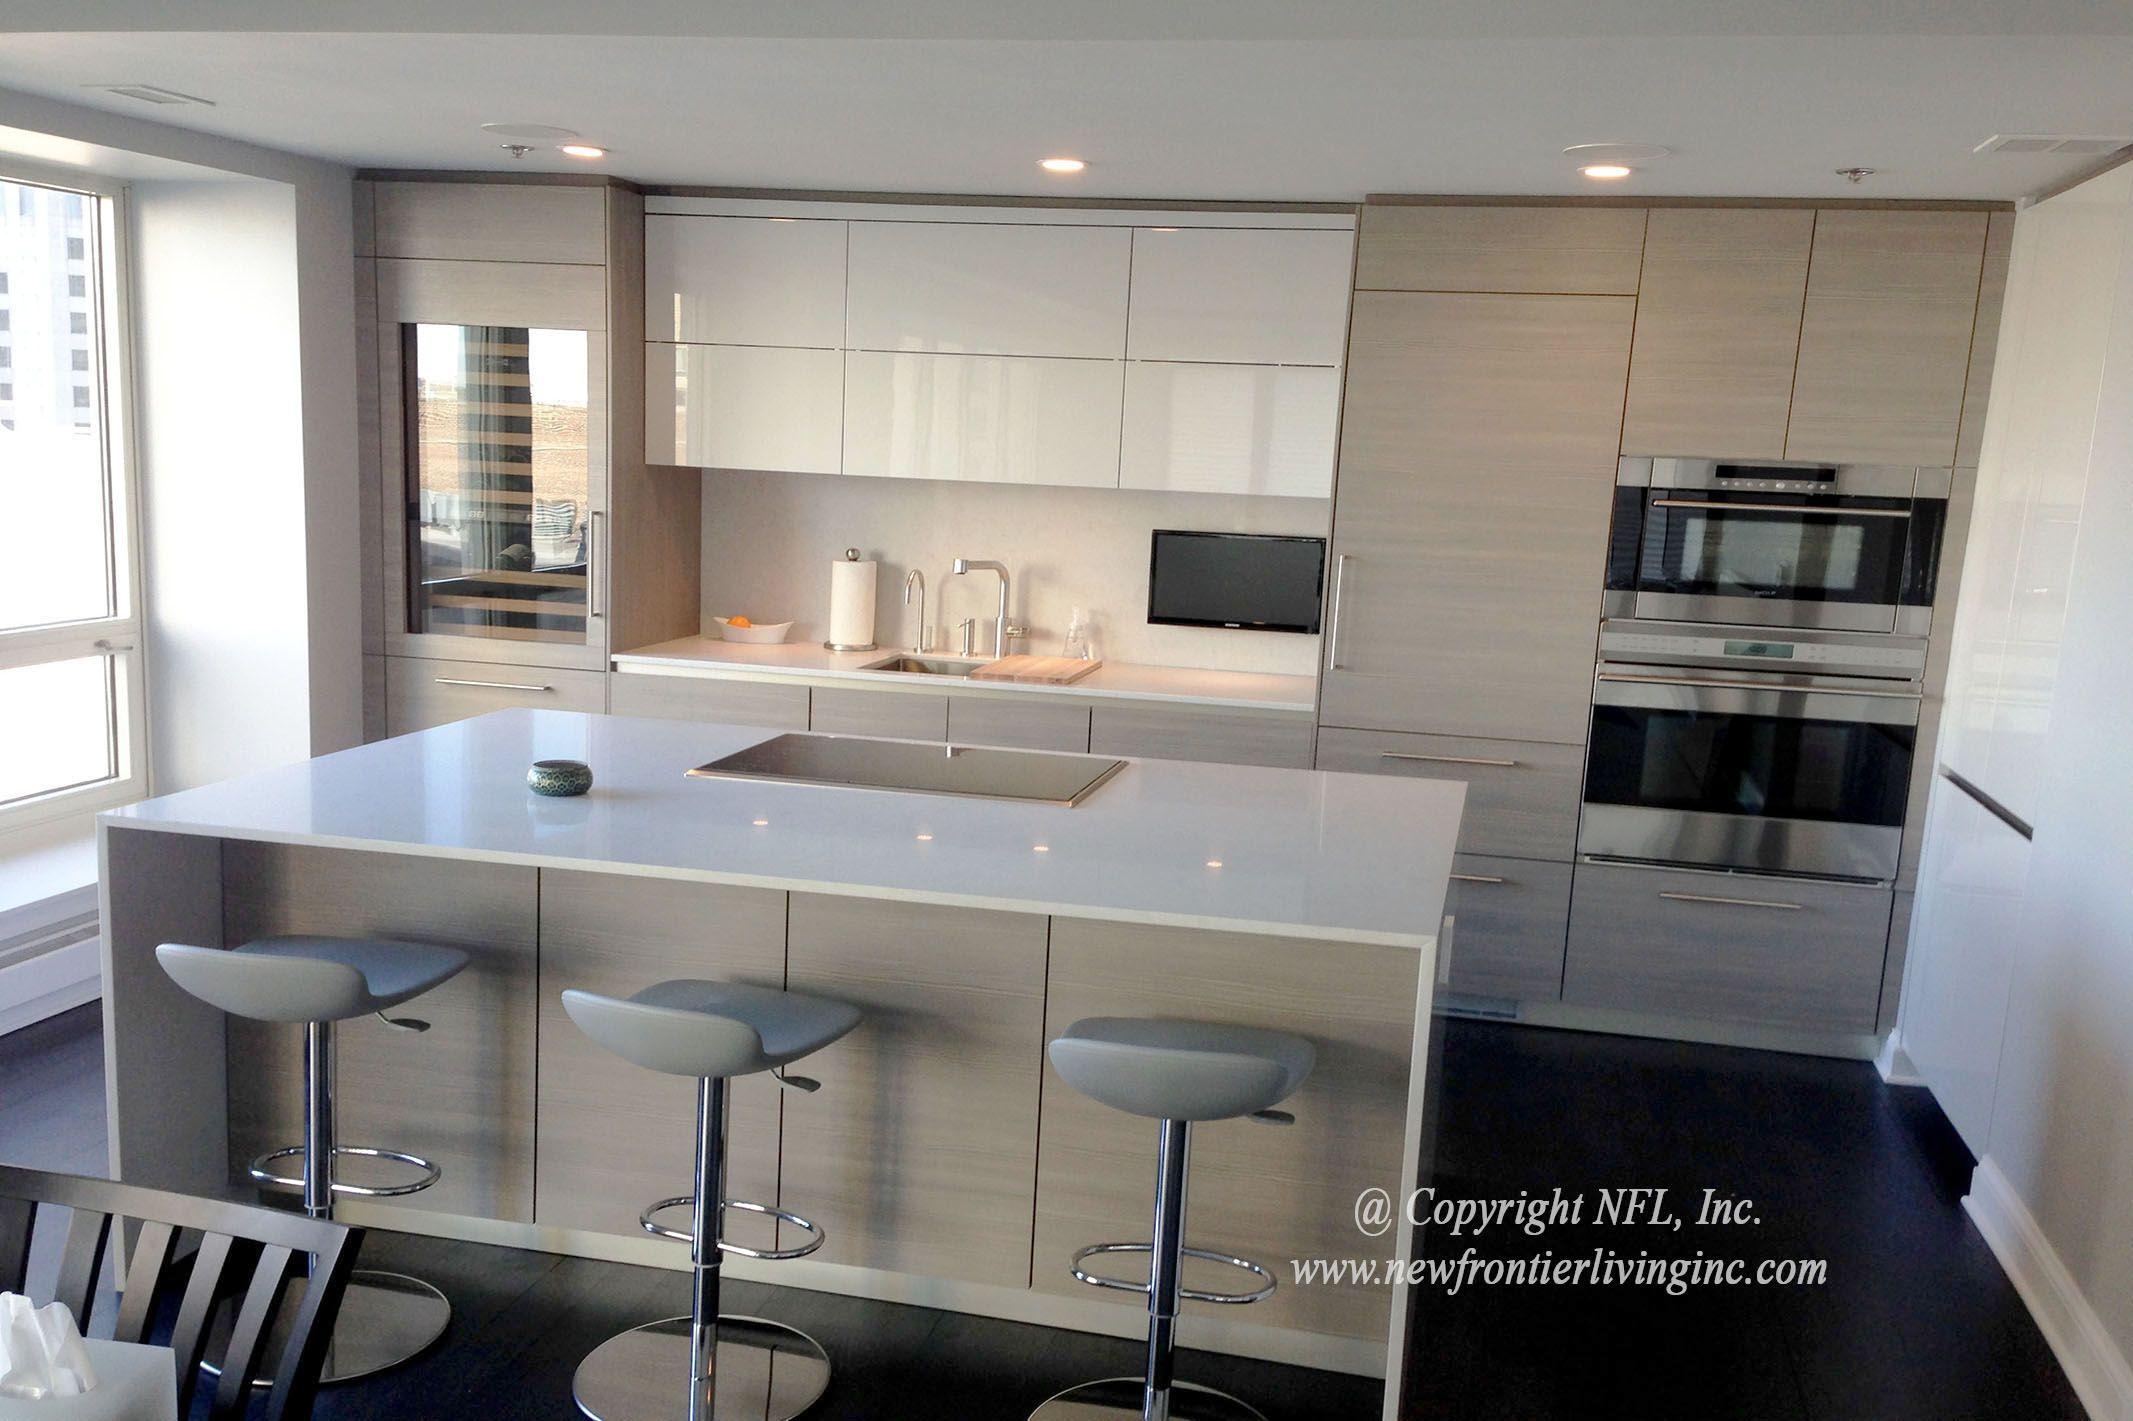 Al al alno kitchen cabinets chicago - Snaidero Kitchen Cabinetry 57 E Delware Chicago Il 2014 Newfrontierlivinginc Kitchen Remodeling Kitchendesign Design Ideas Desi